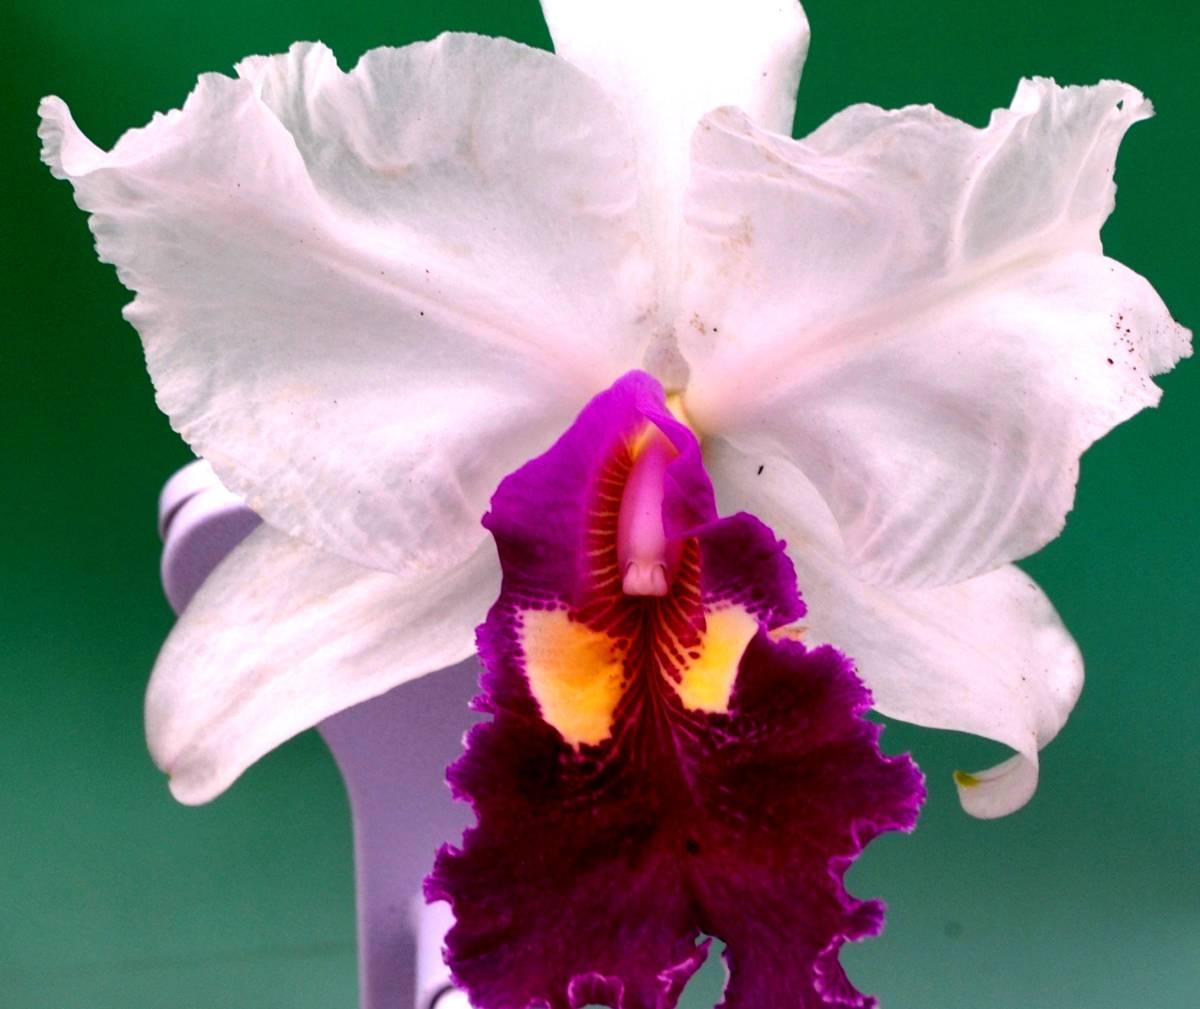 洋蘭原種 C.warscewiczii fma. semi-alba ' Sophia' (女性の名前)(希少original)_画像1